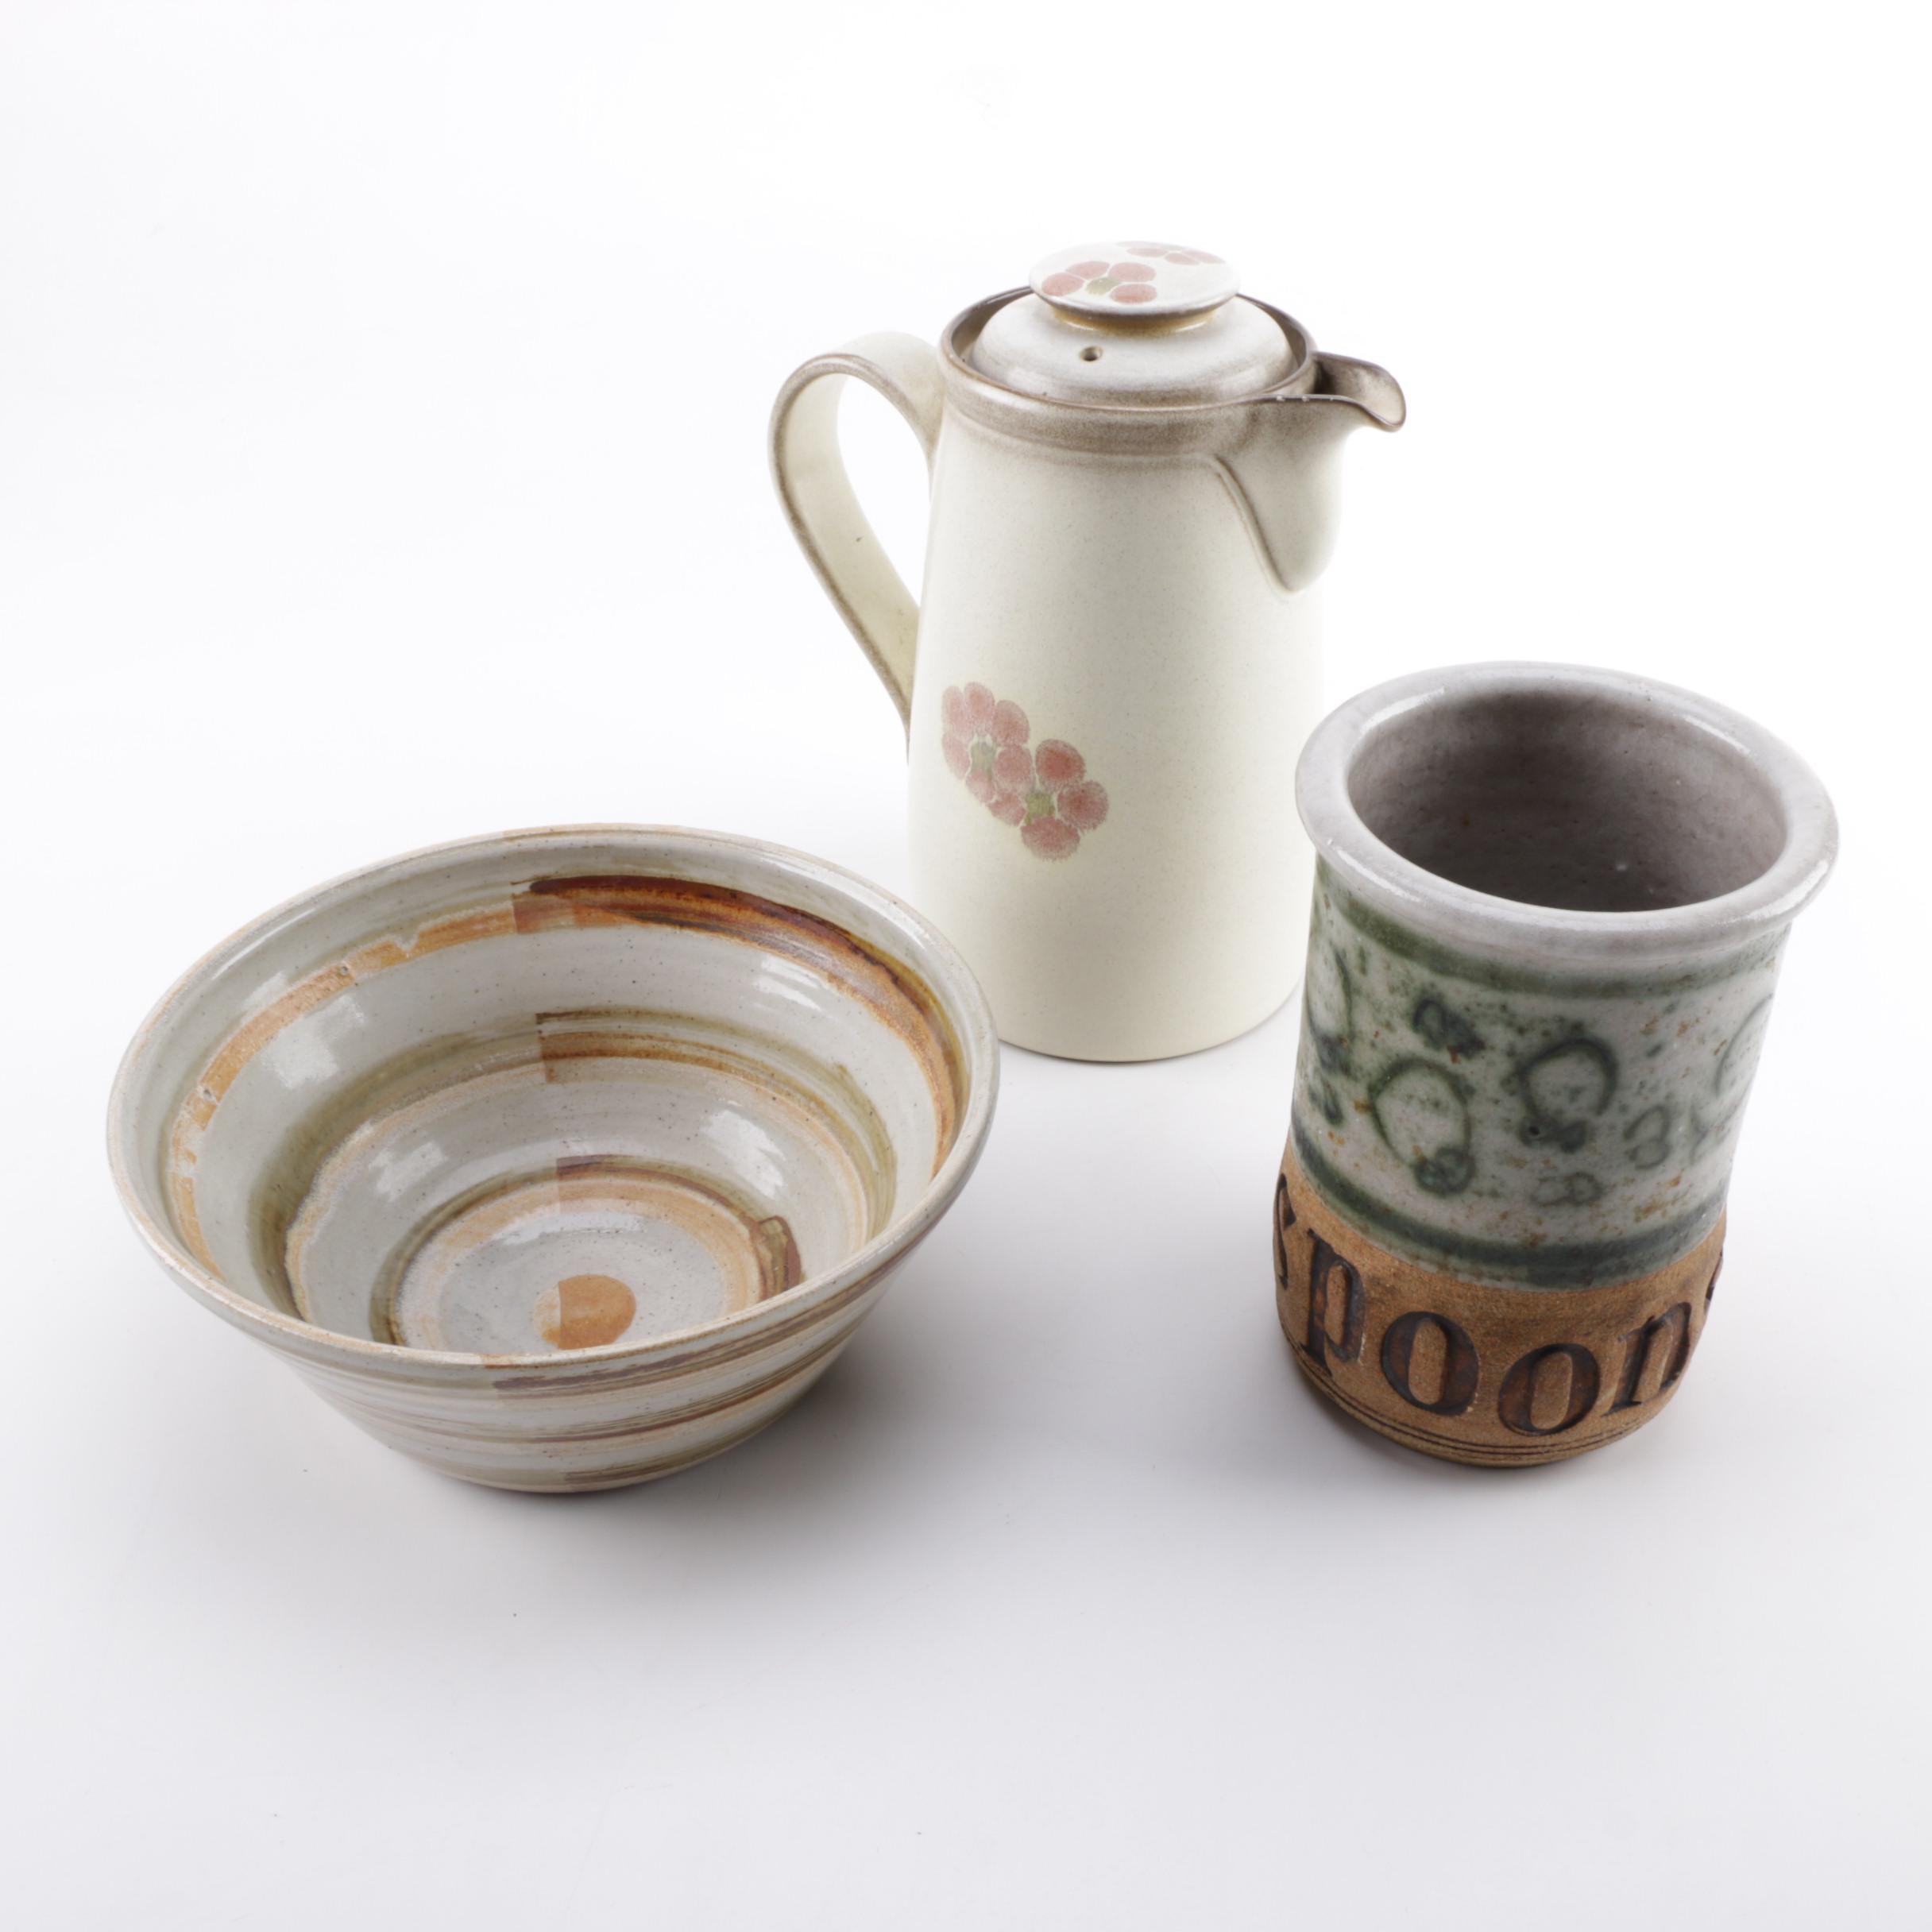 Vintage Denby Stoneware and Art Pottery ...  sc 1 st  EBTH.com & Vintage Denby Stoneware and Art Pottery : EBTH